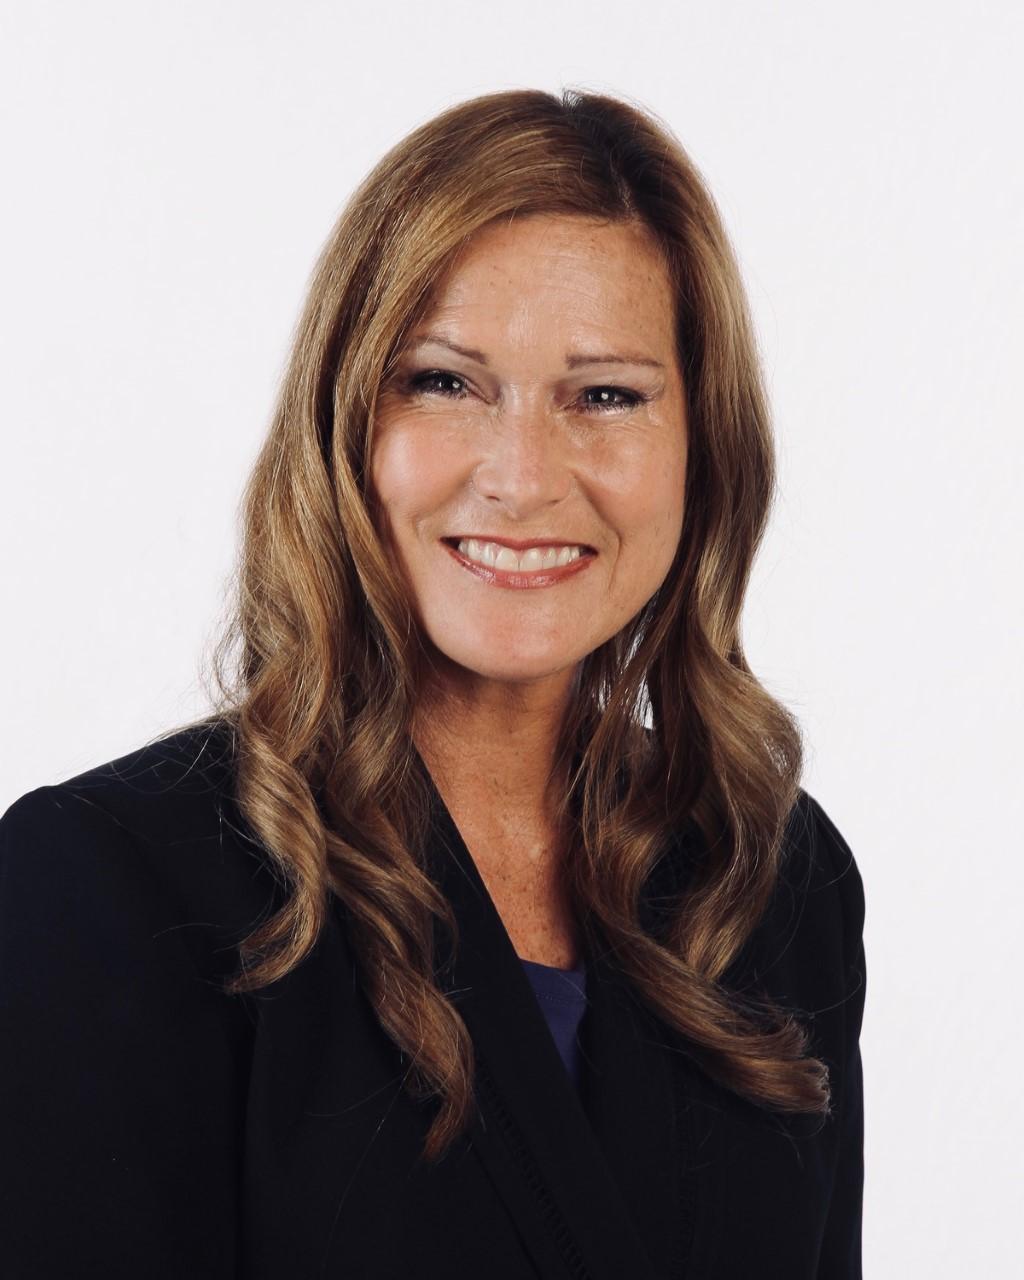 Renee Skillett